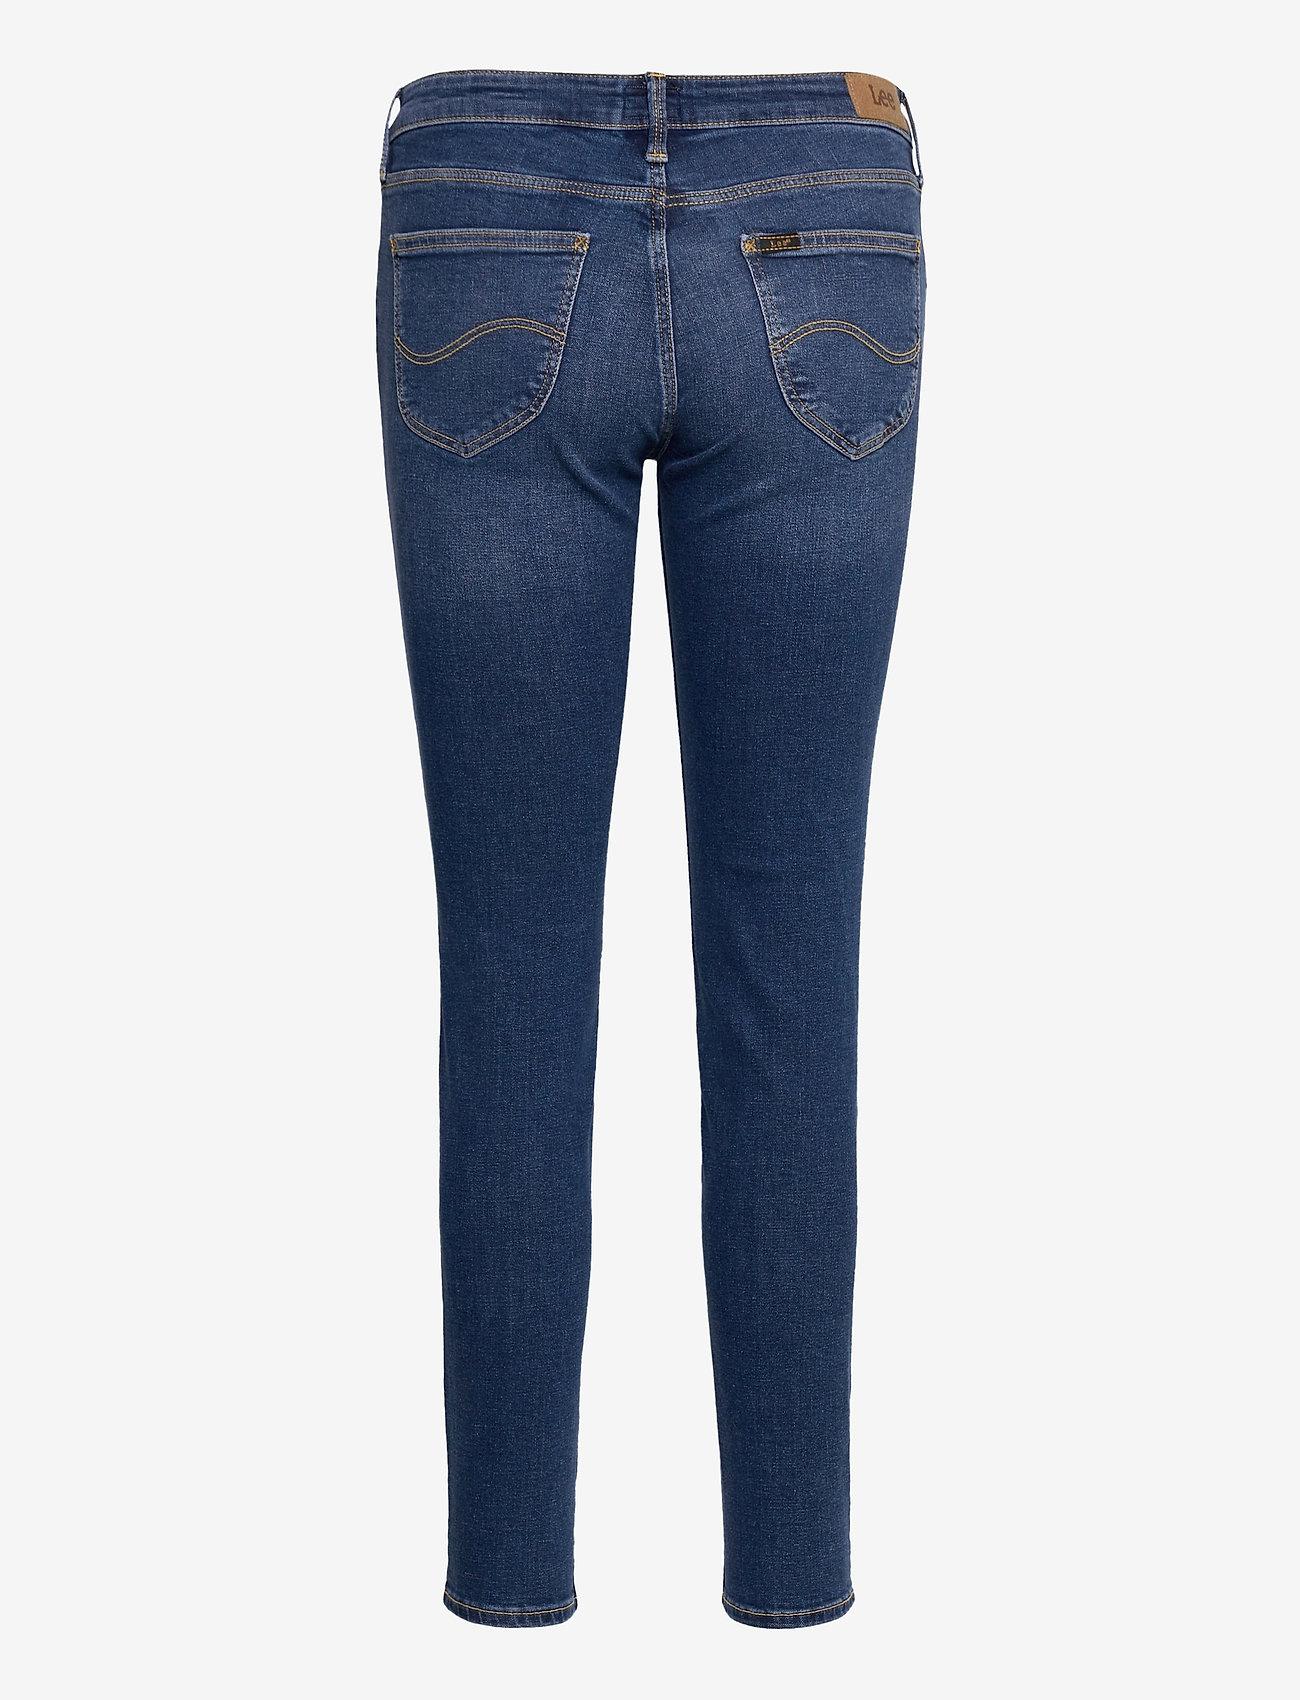 Lee Jeans - SCARLETT - skinny jeans - mid martha - 1